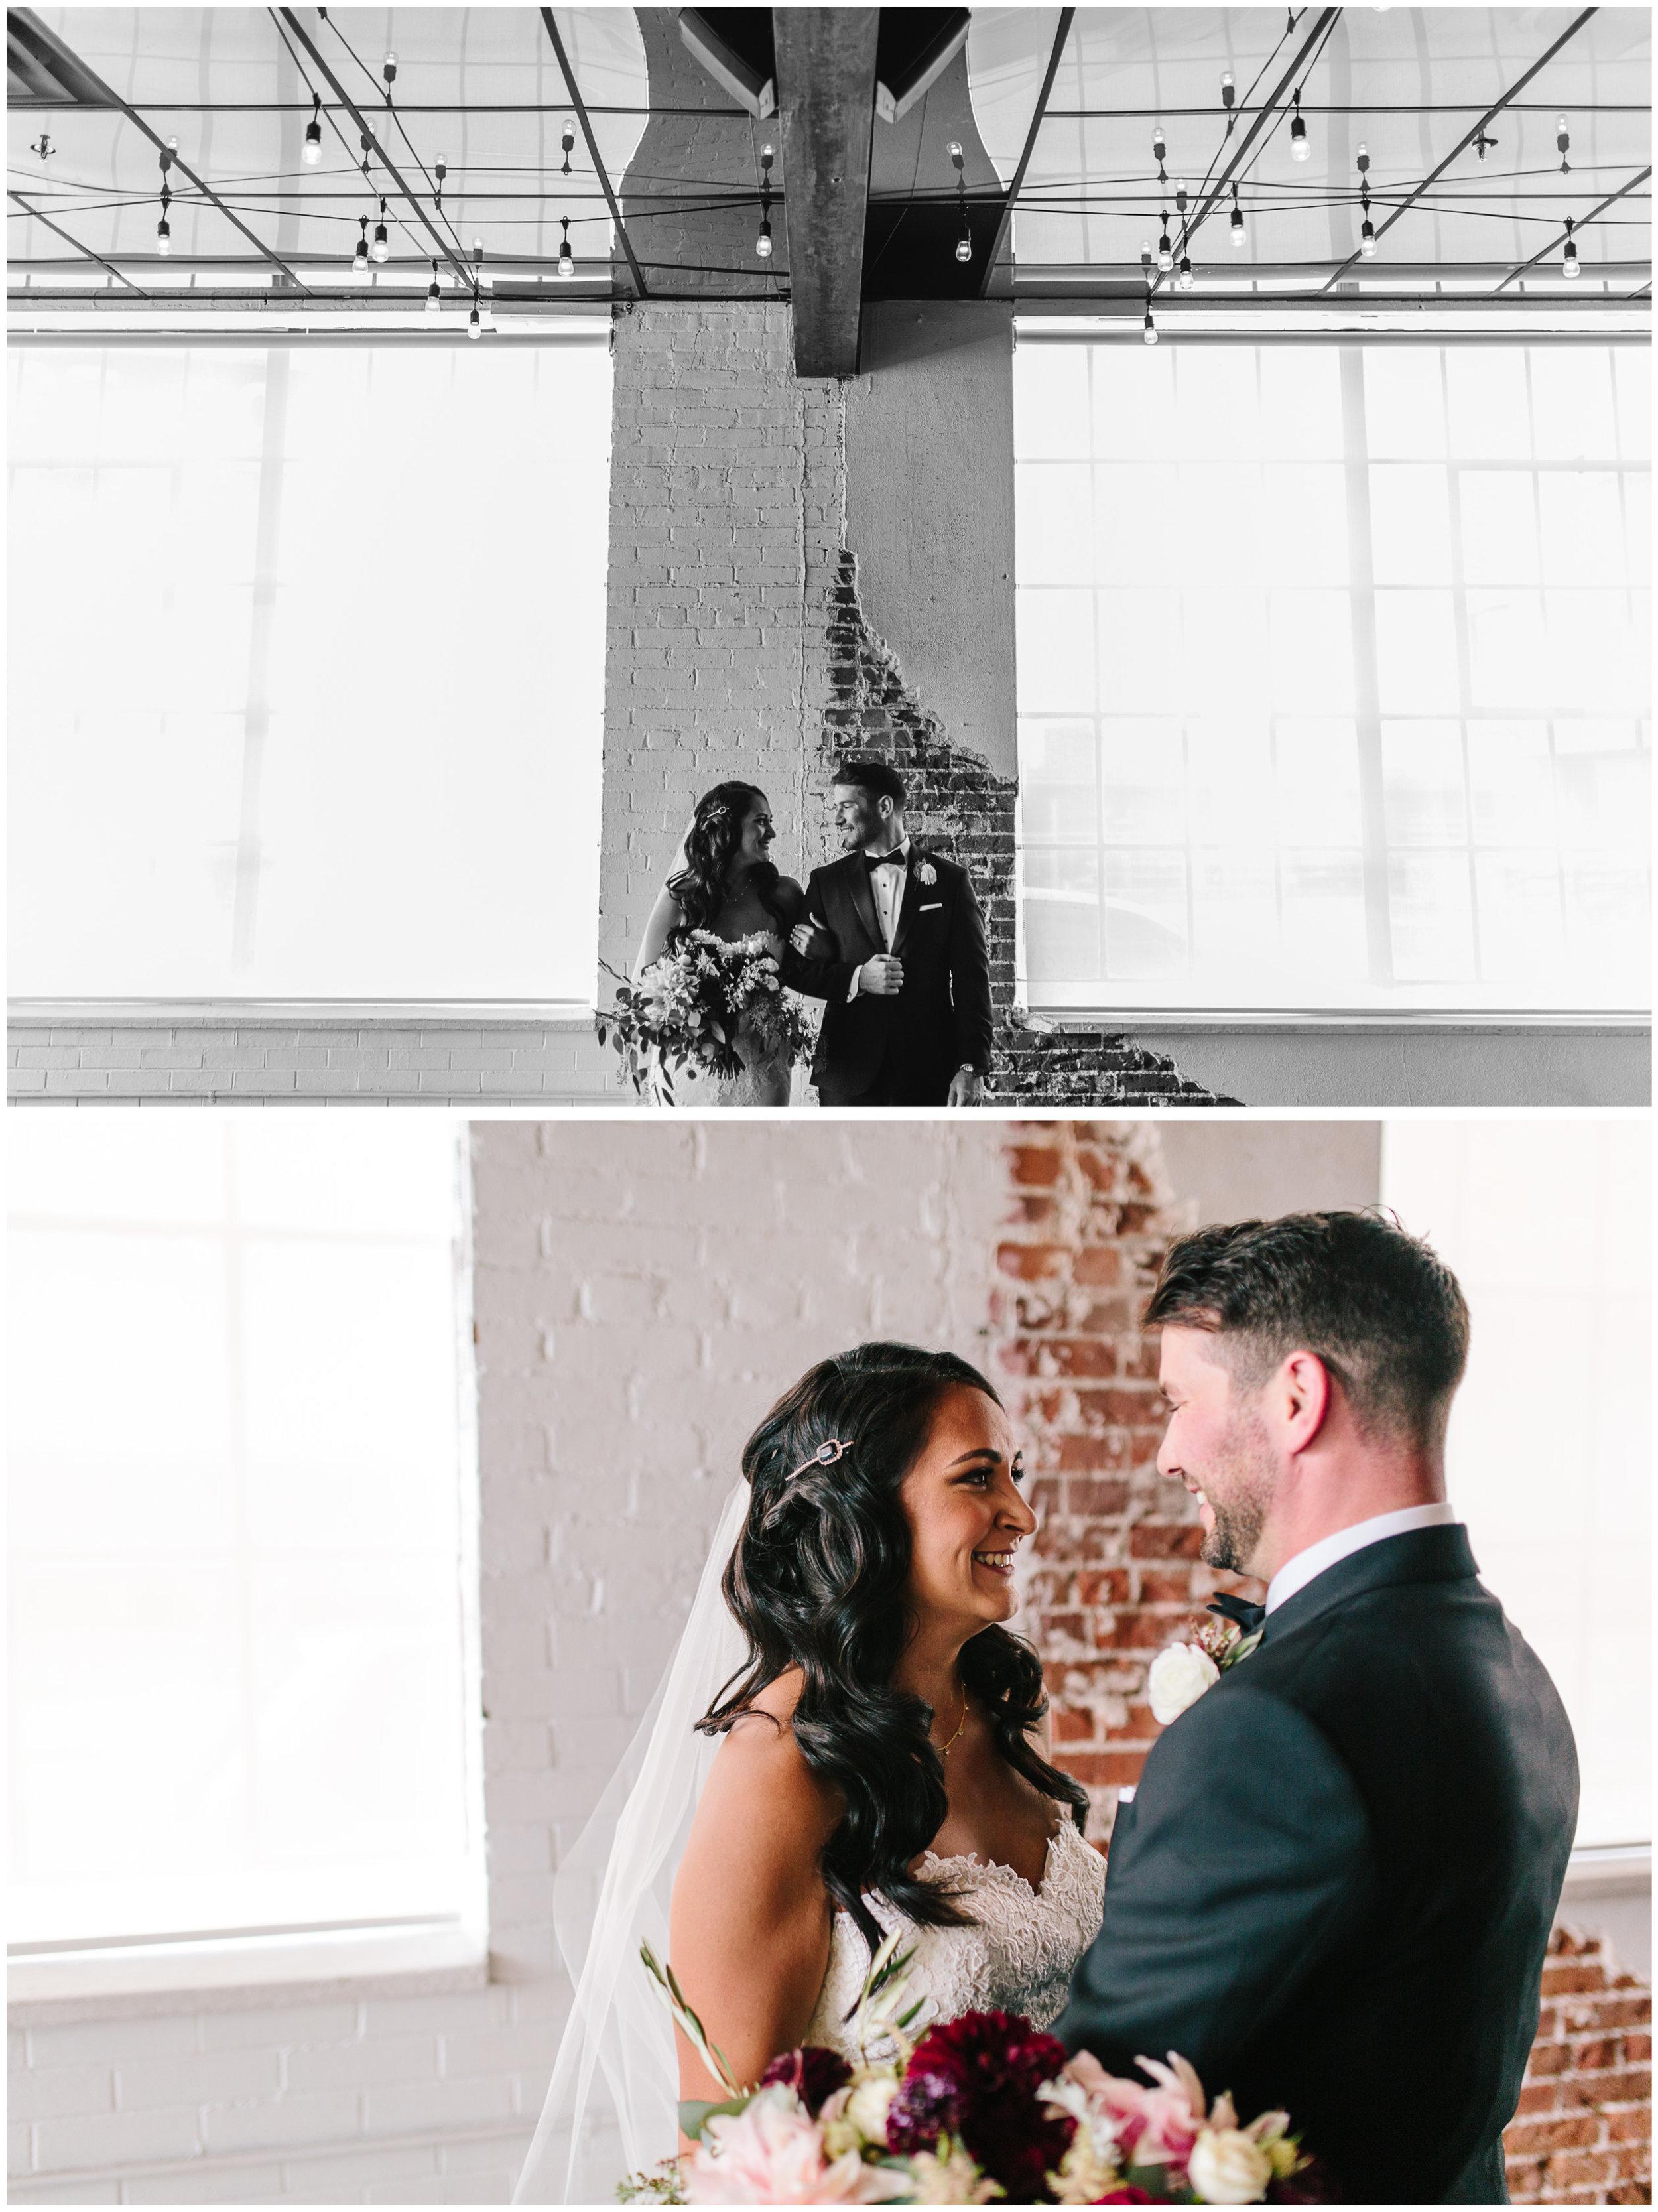 moss_denver_wedding_24.jpg